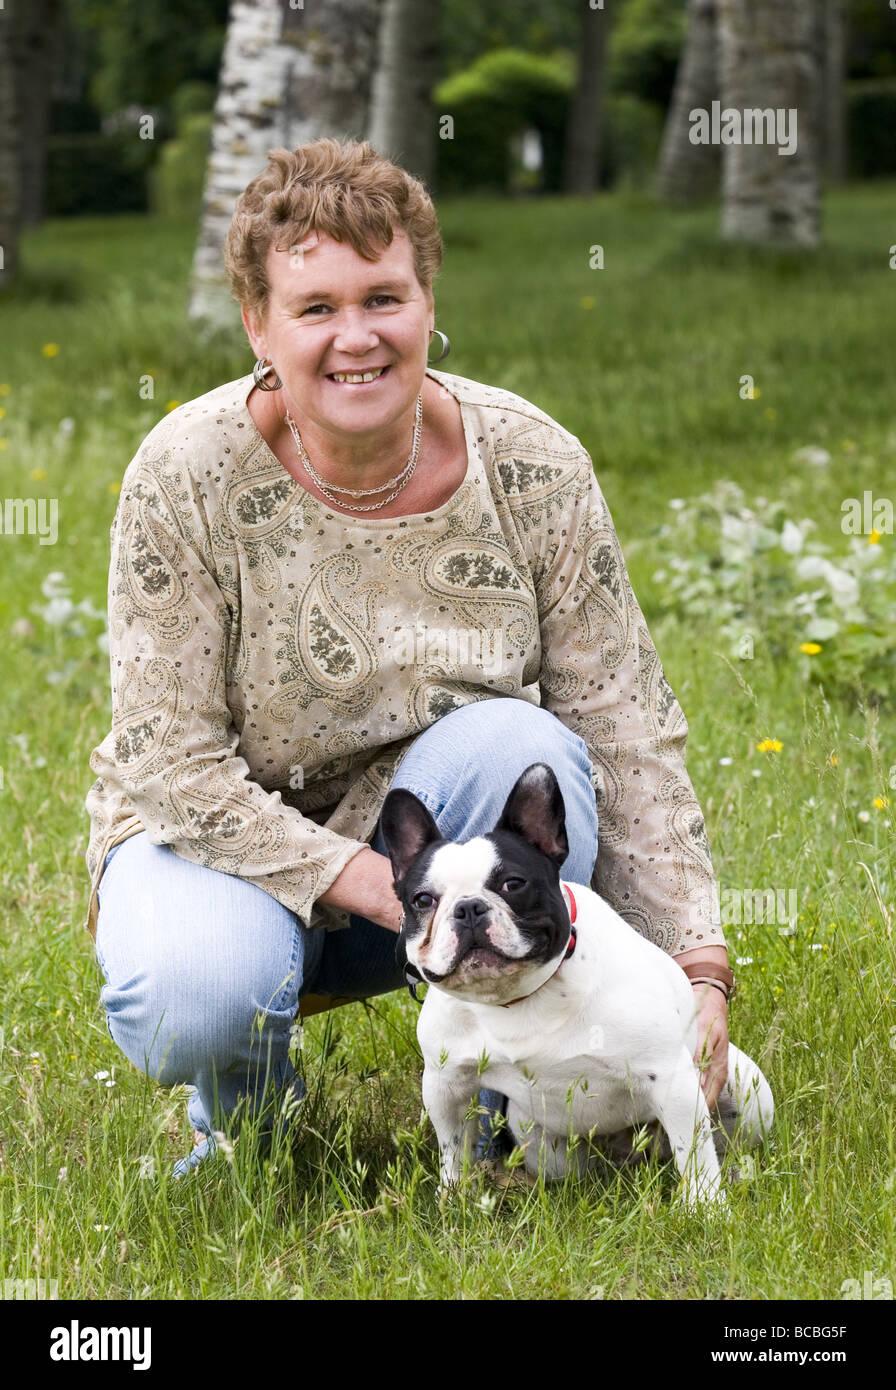 Woman portrait with pitbull dog SerieCVS517505 - Stock Image